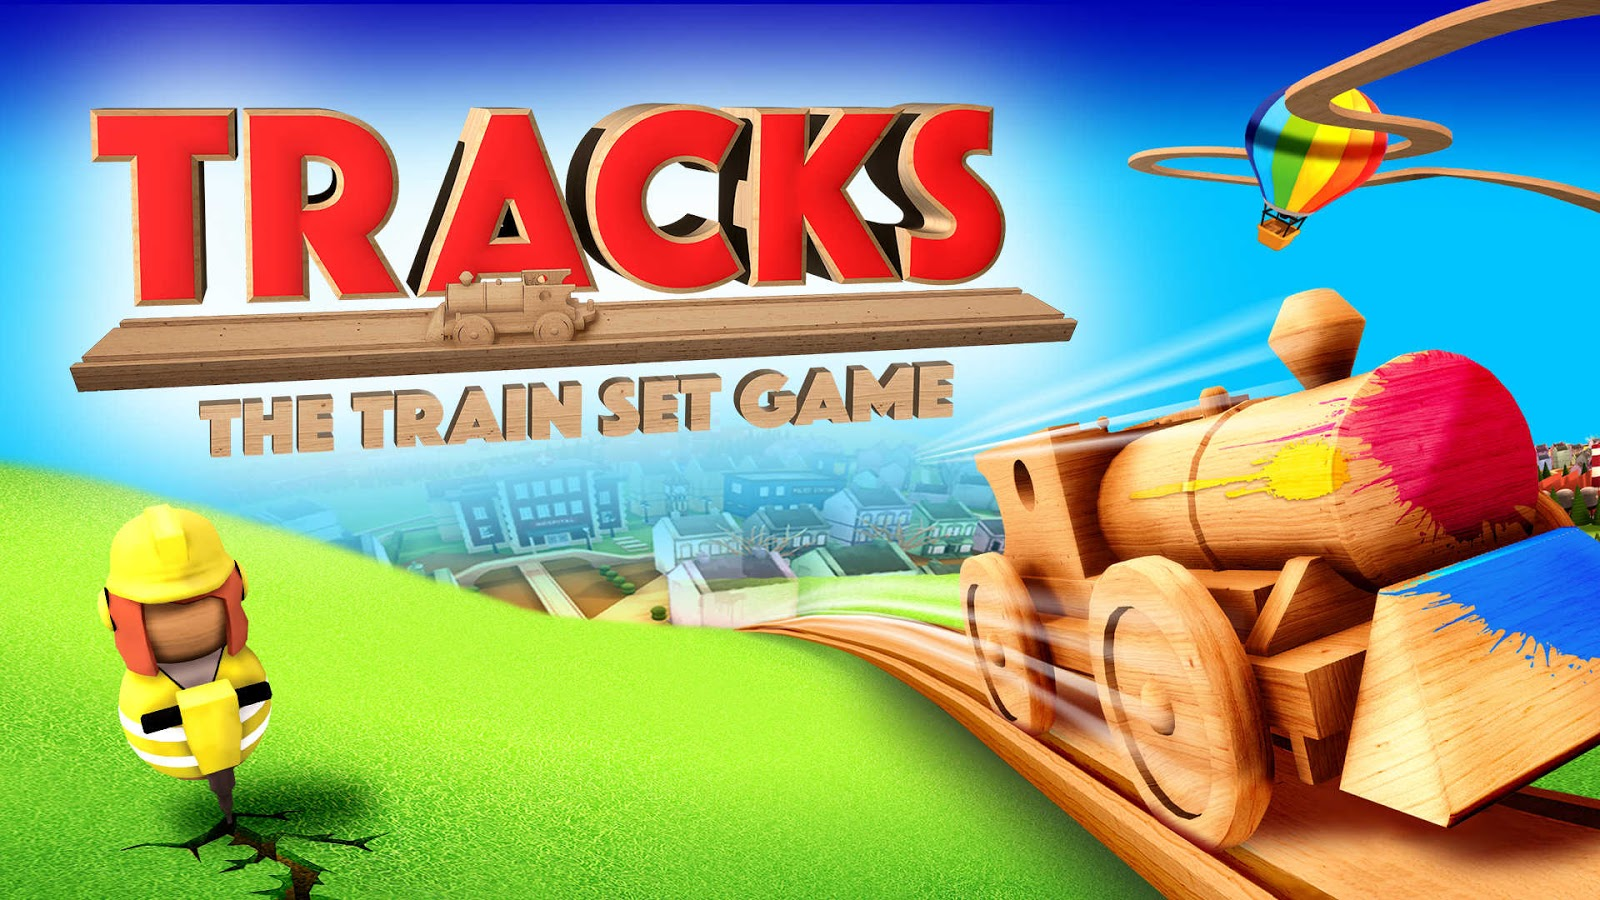 tracks-the-family-friendly-open-world-train-set-game